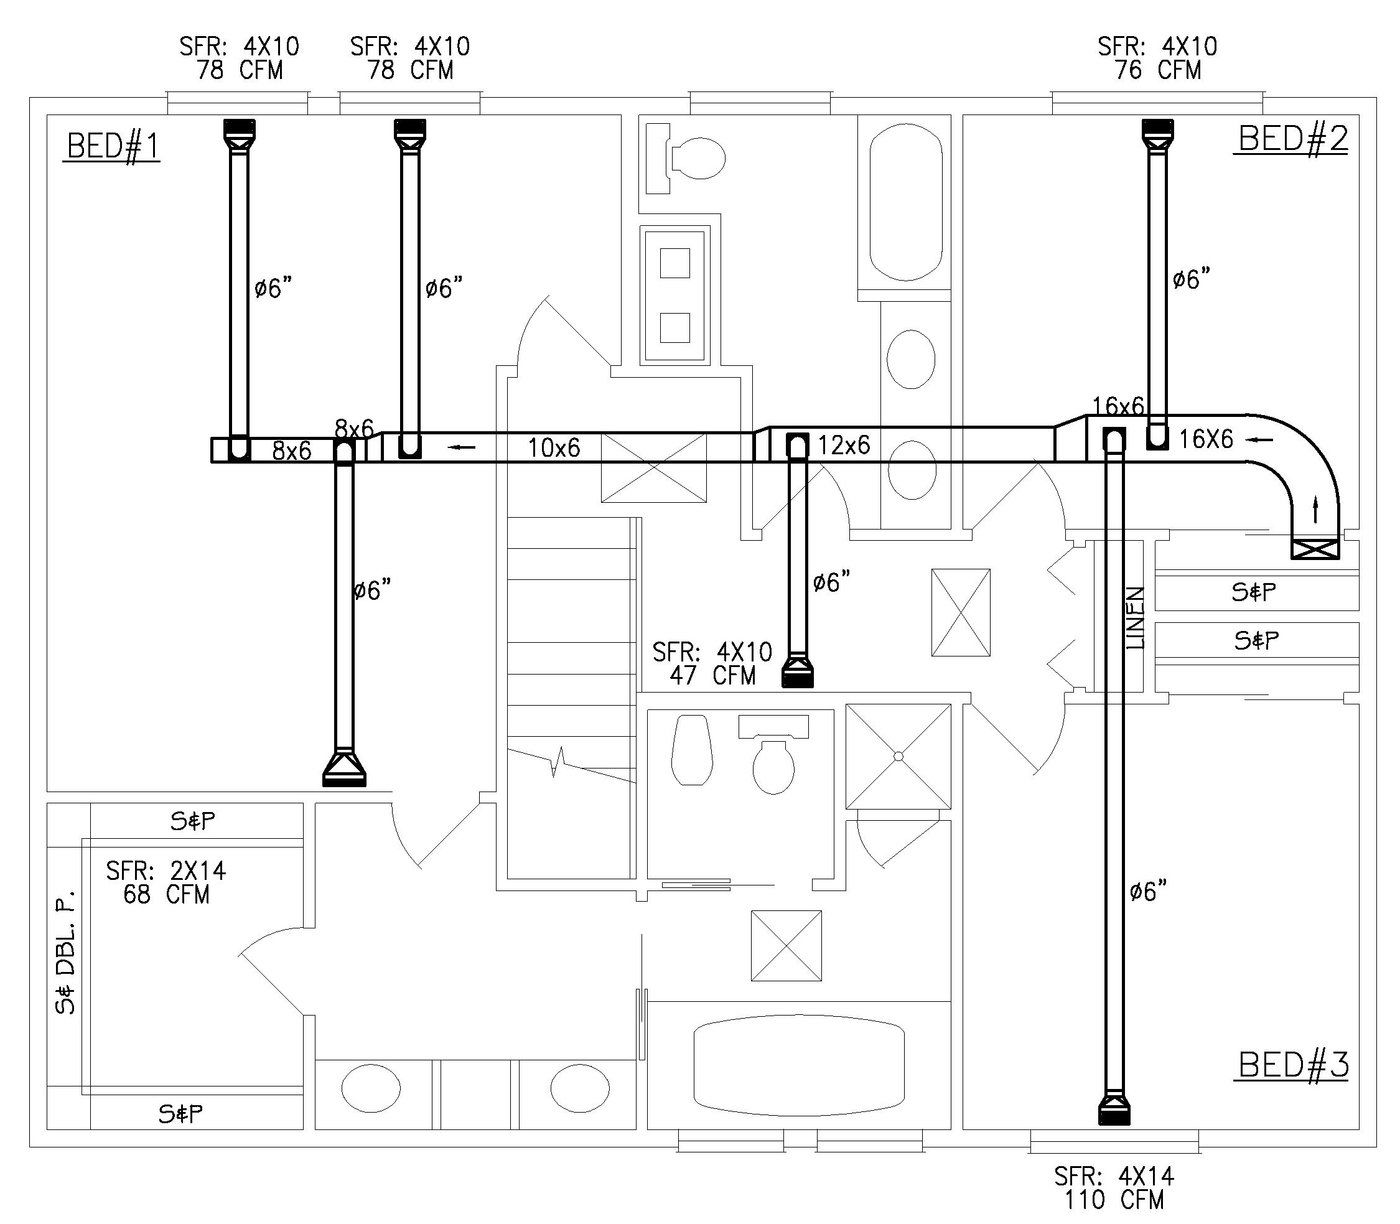 Hvac Plans By Raymond Alberga At Coroflot In